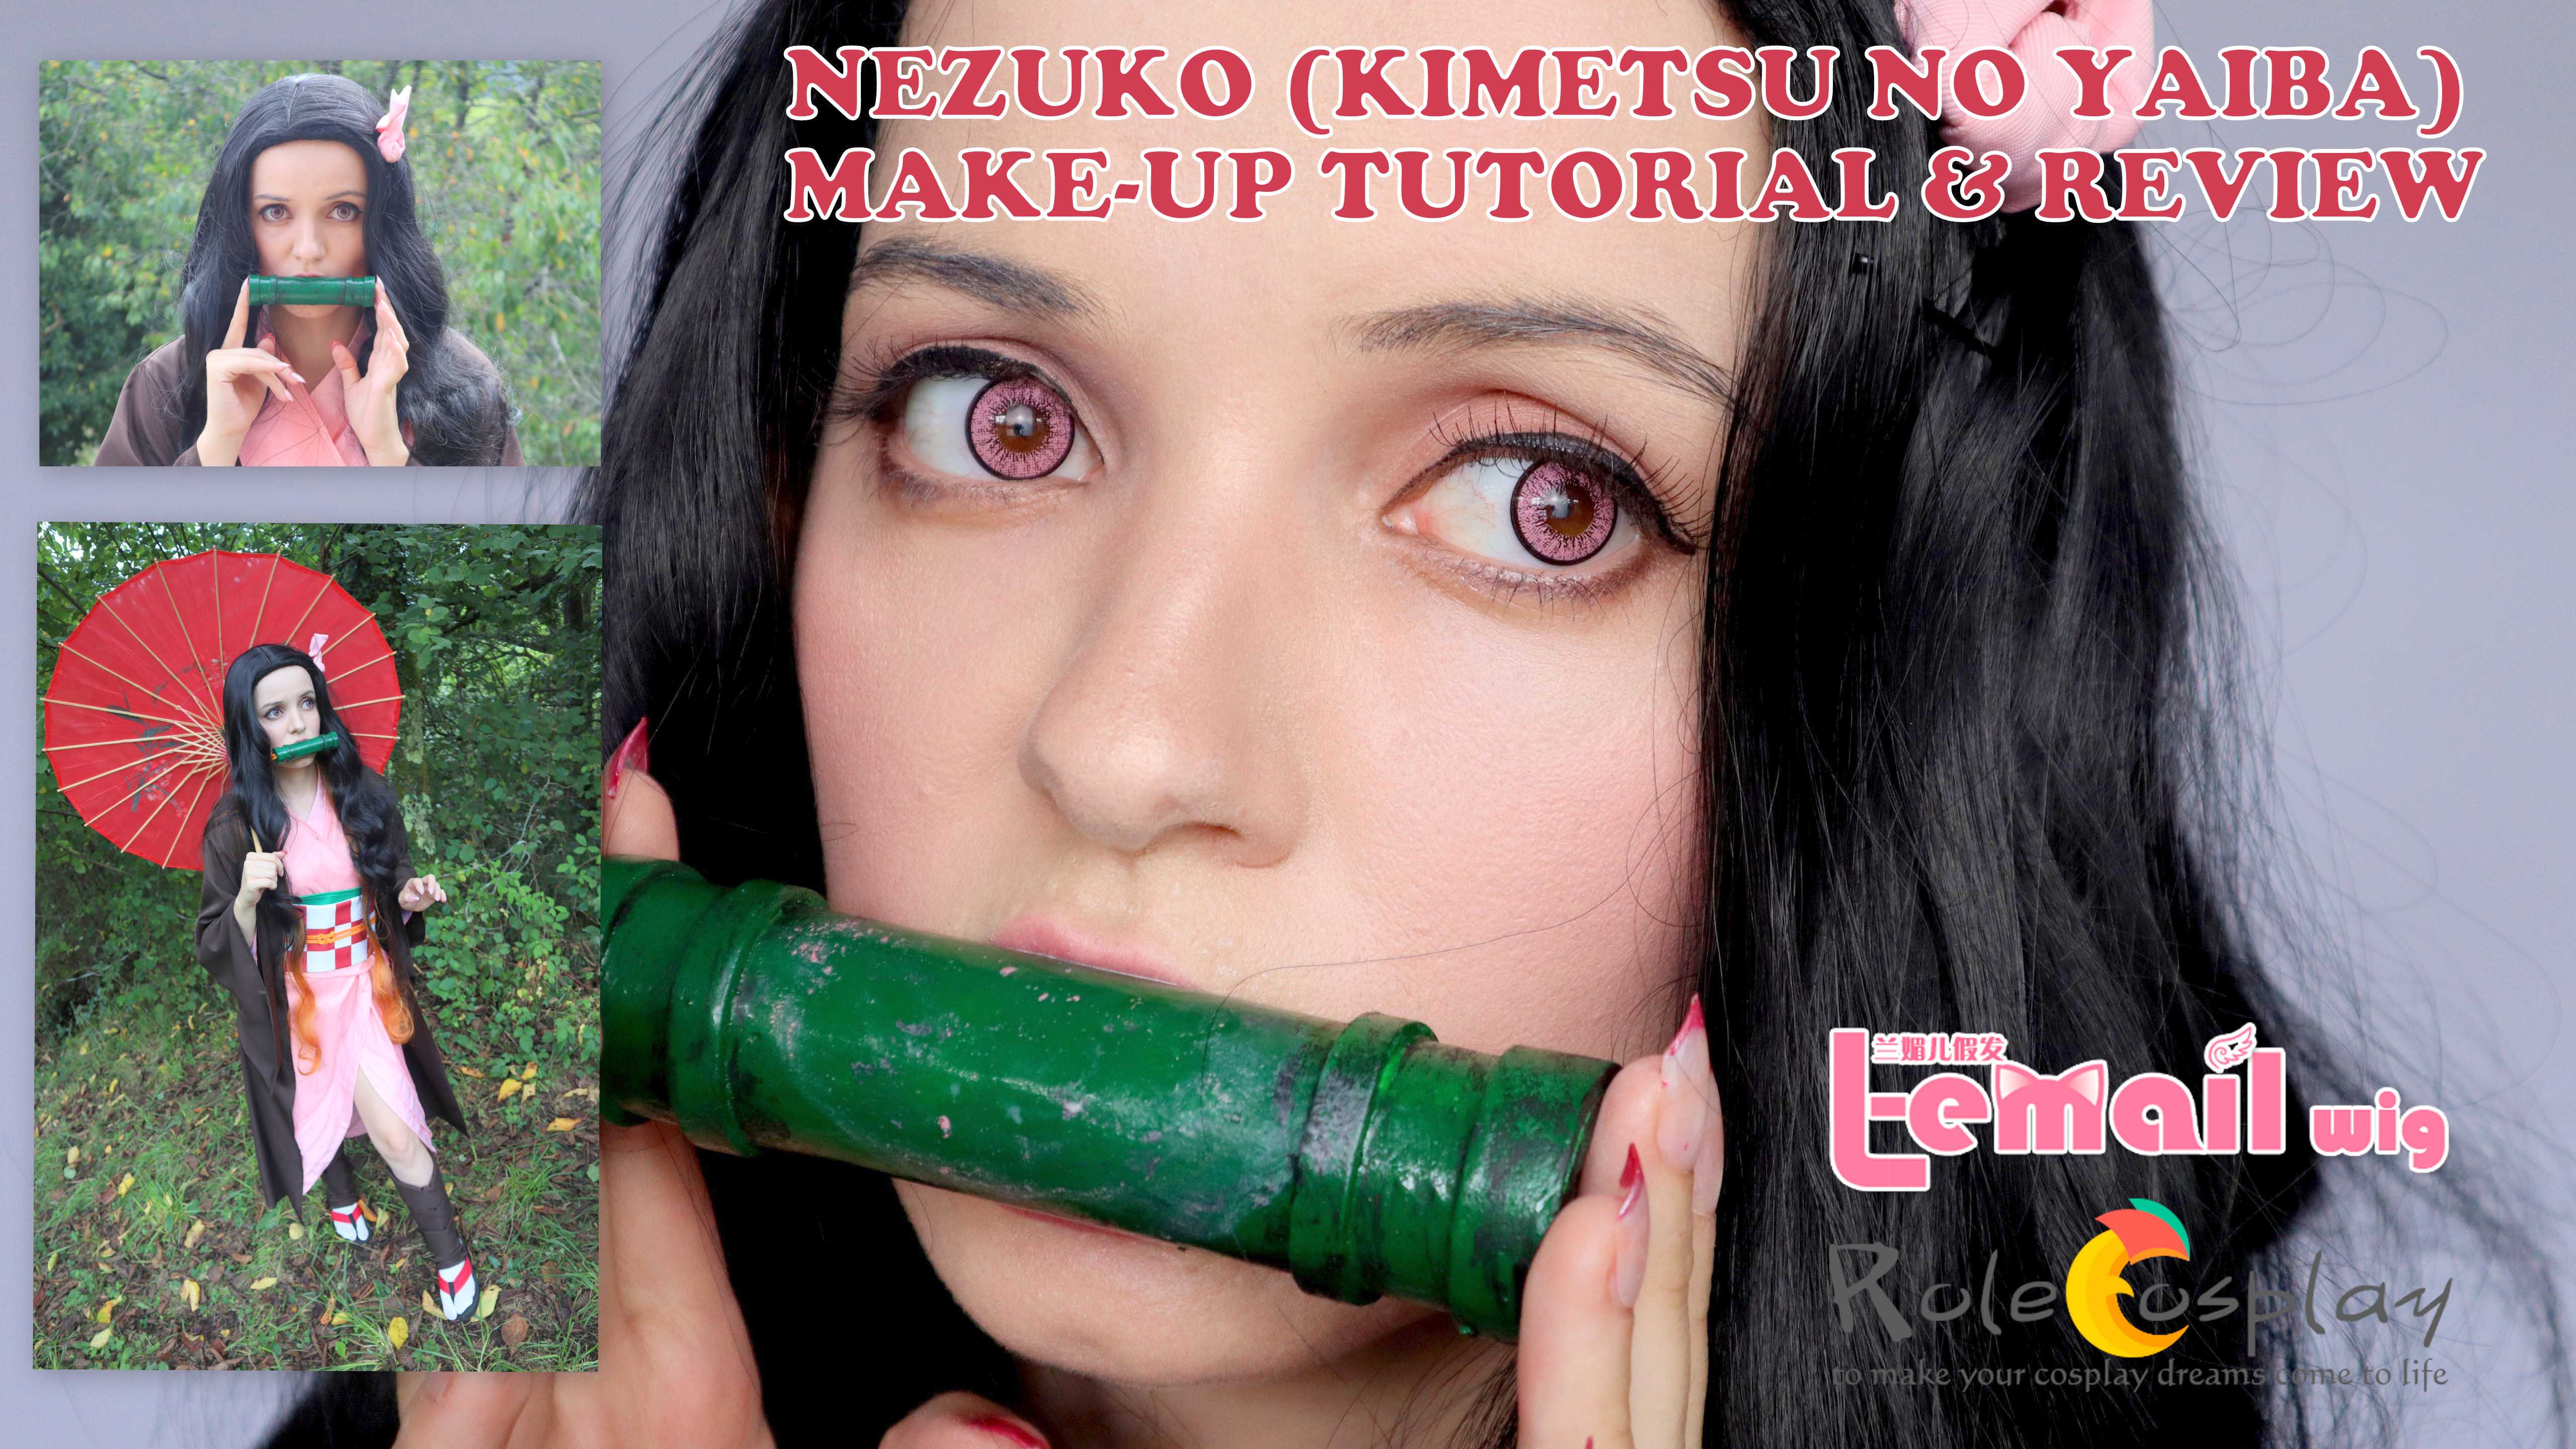 Cosplay Make-up & Review: Nezuko Kamado (Kimetsu no Yaiba) from L-email // Rolecosplay